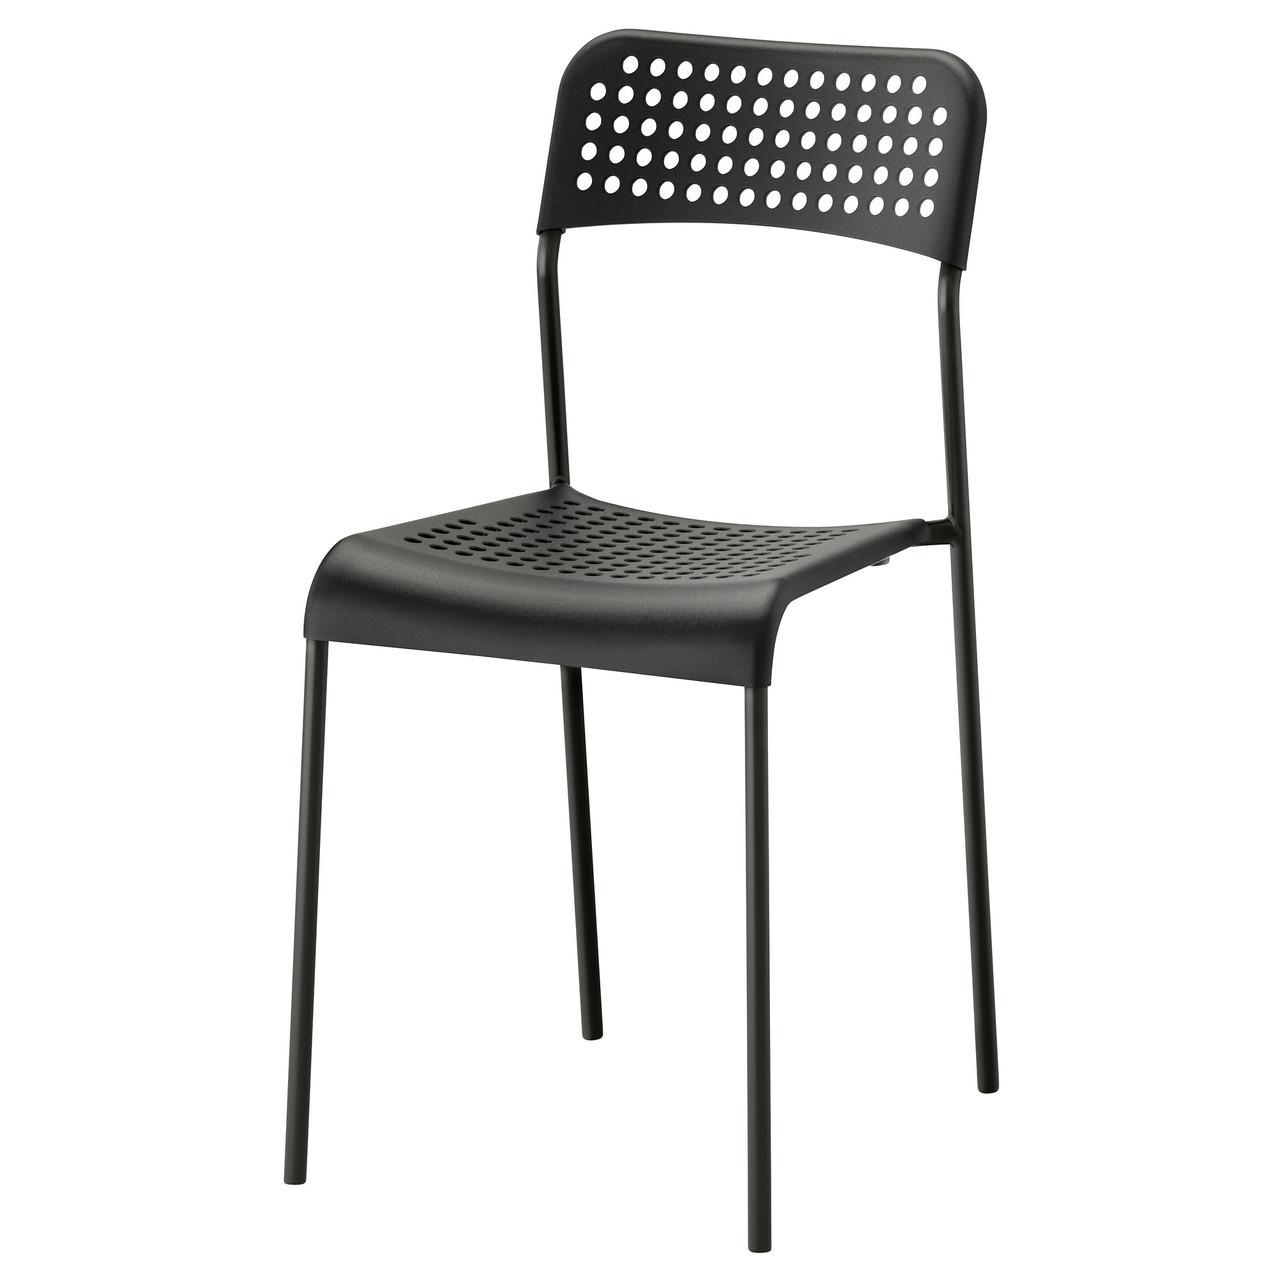 Стул икеа ADDE , черный, IKEA, 902.142.85